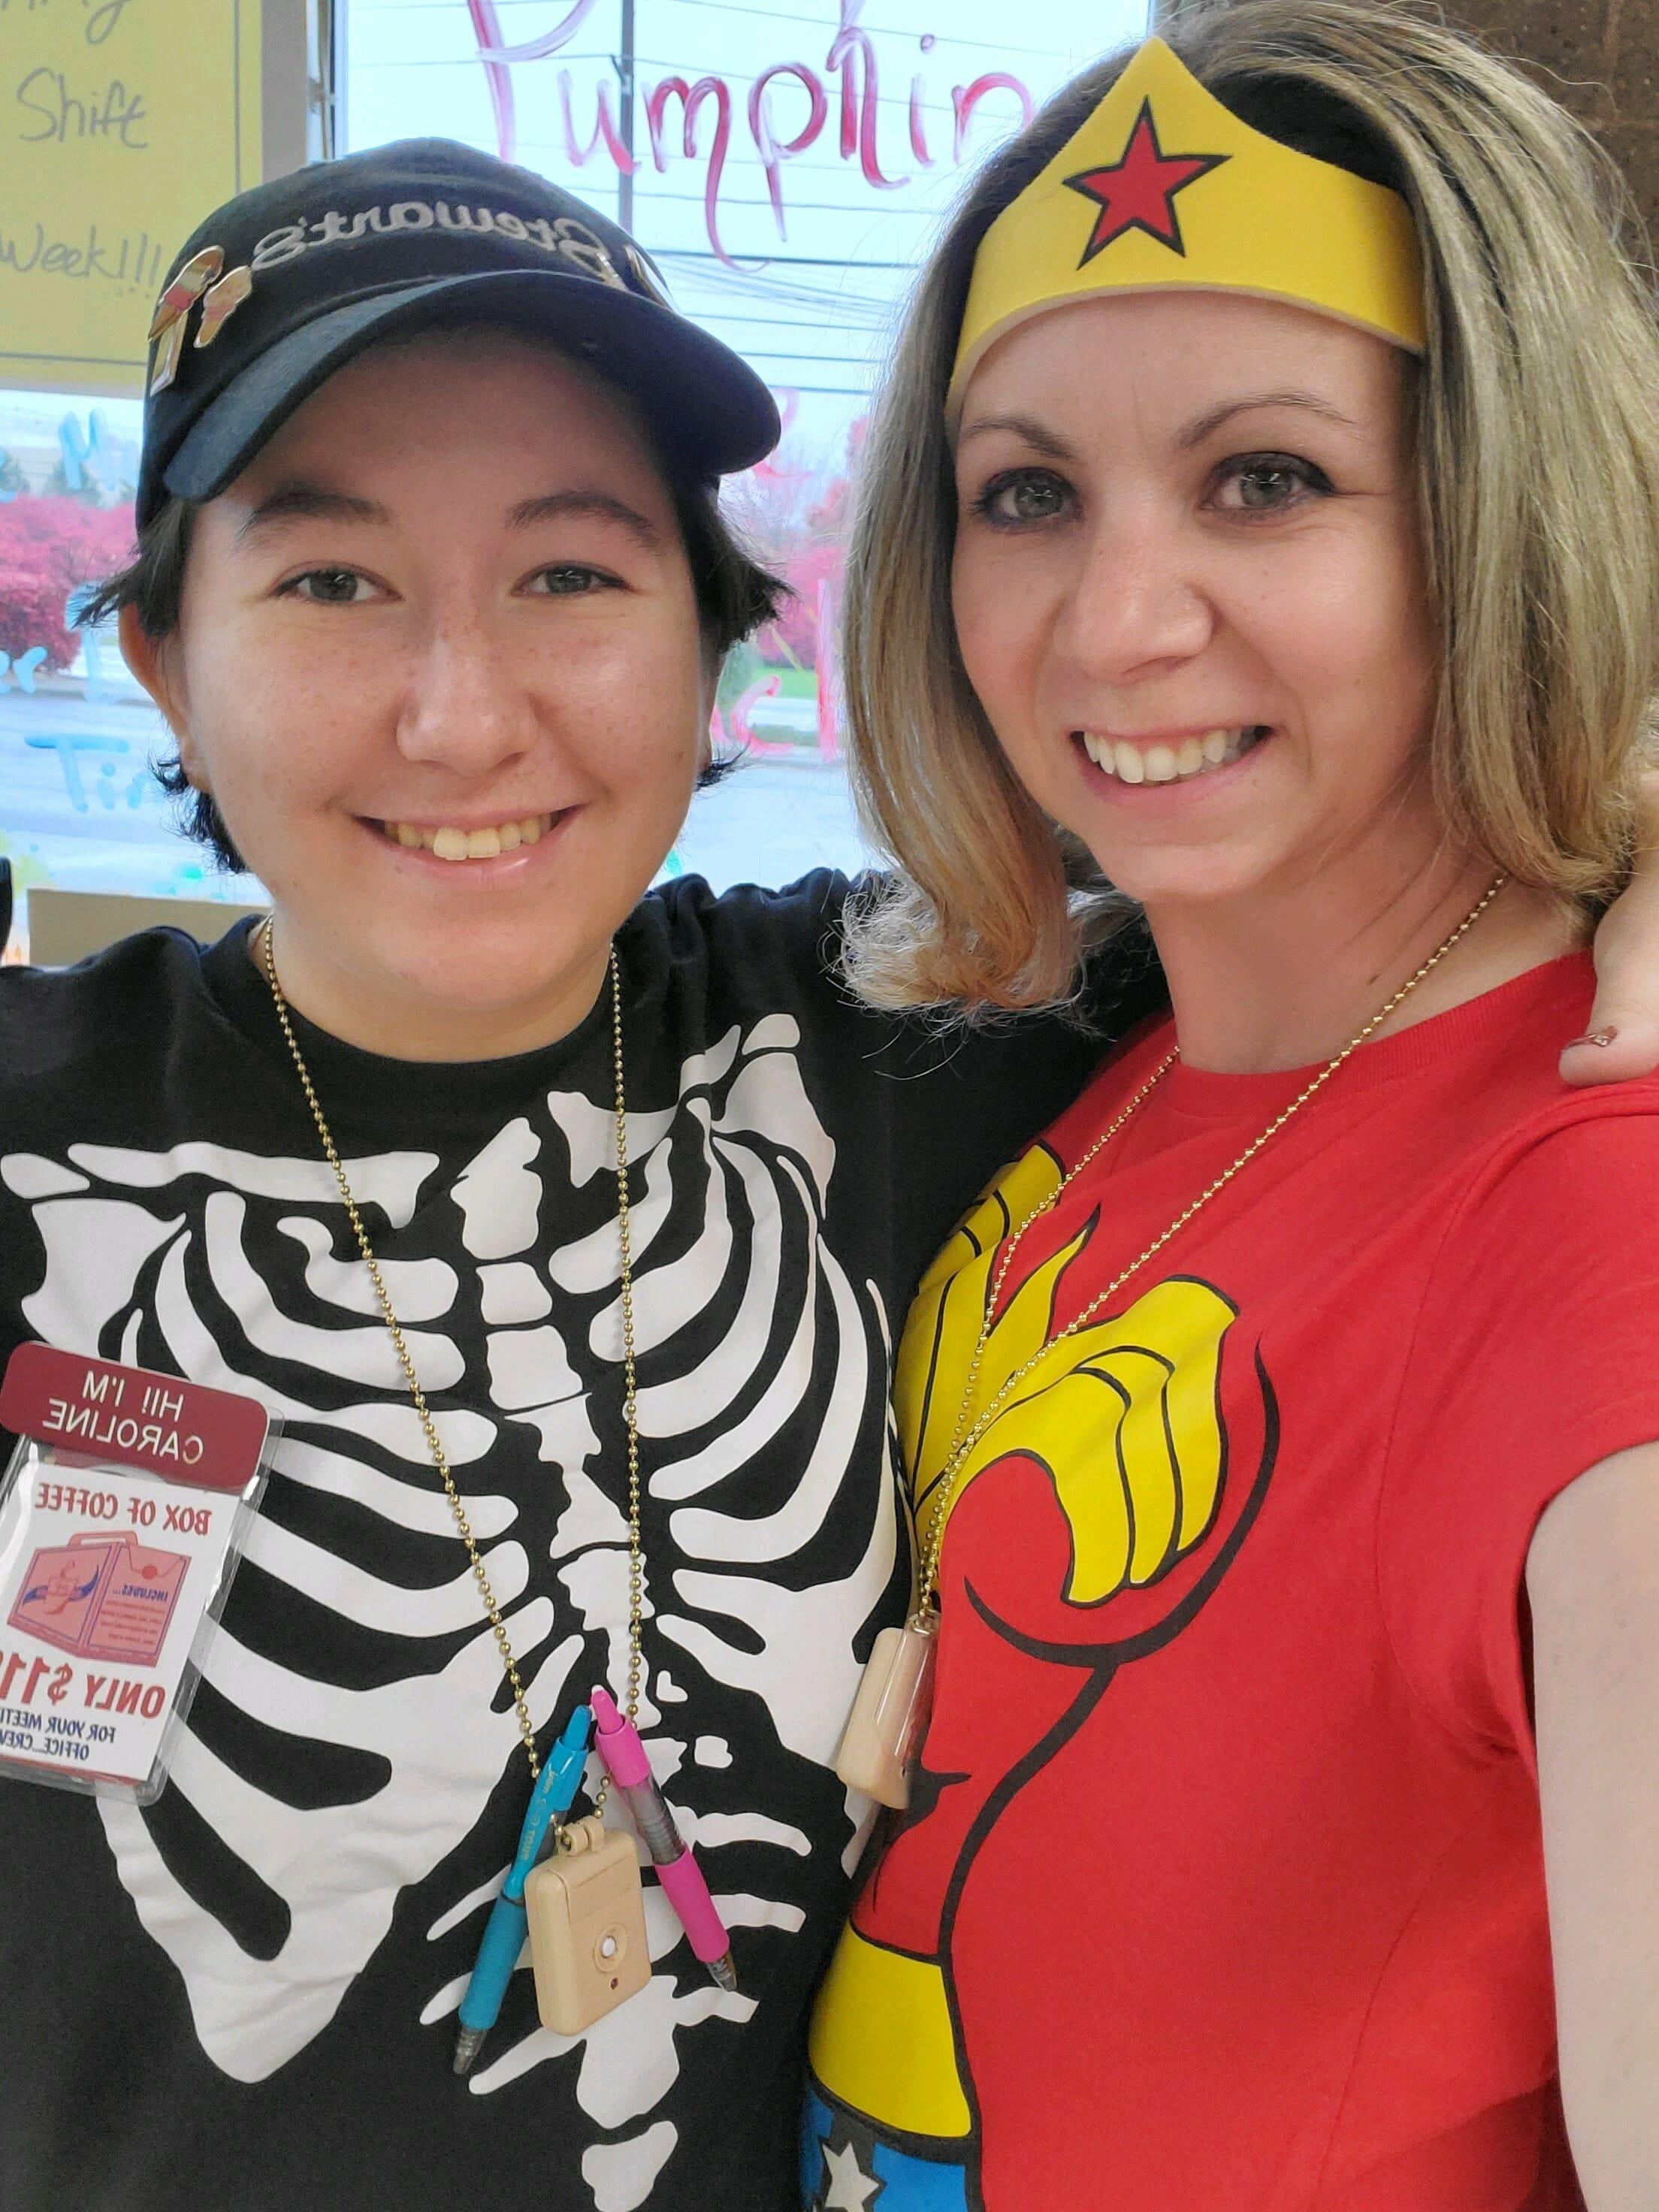 Super hero costume and skeleton